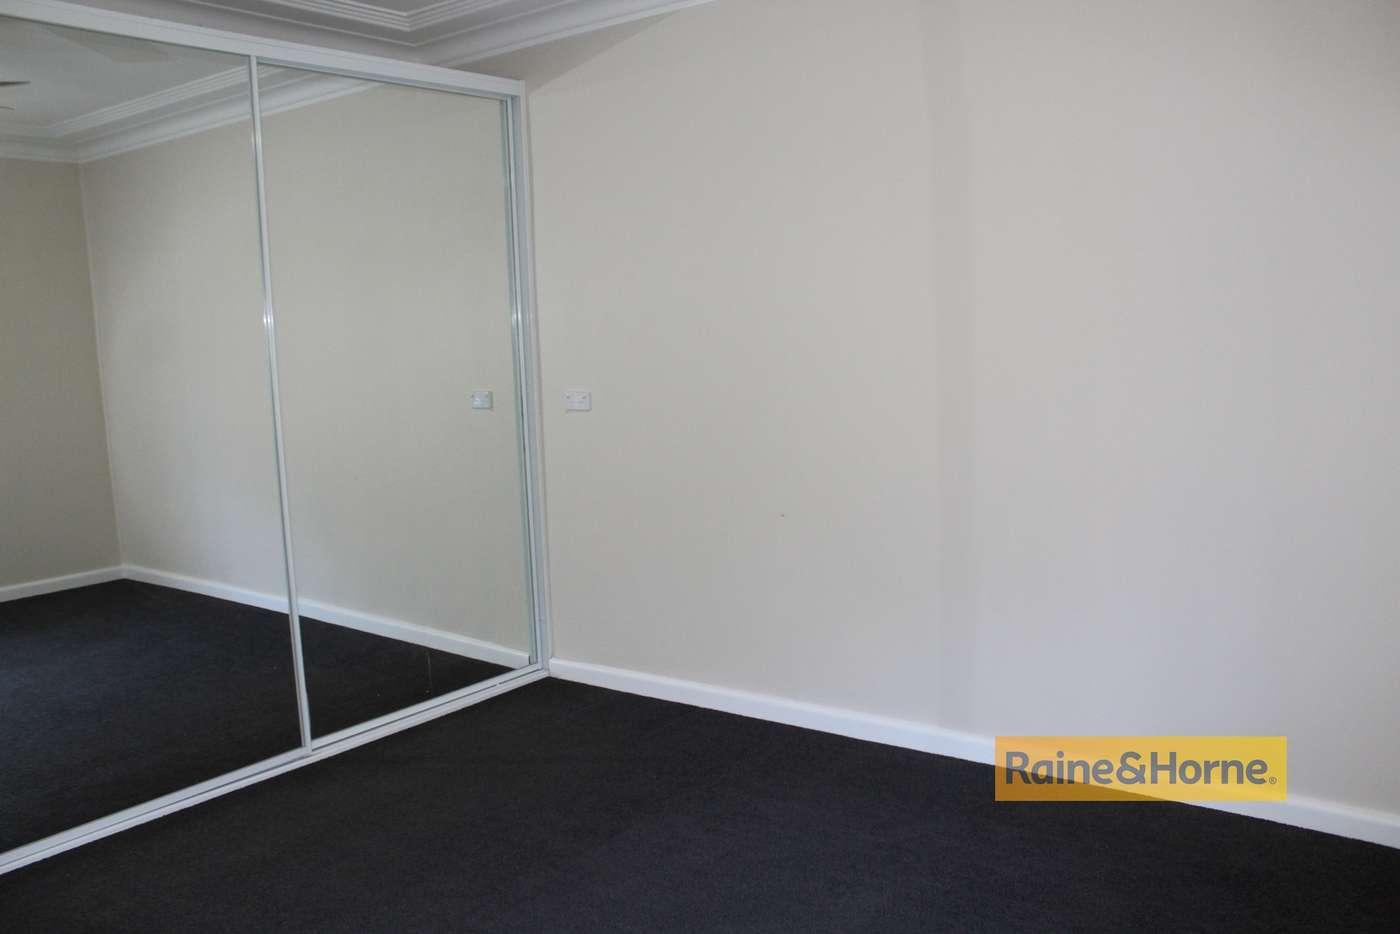 Sixth view of Homely house listing, 46 Ridge Street, Ettalong Beach NSW 2257